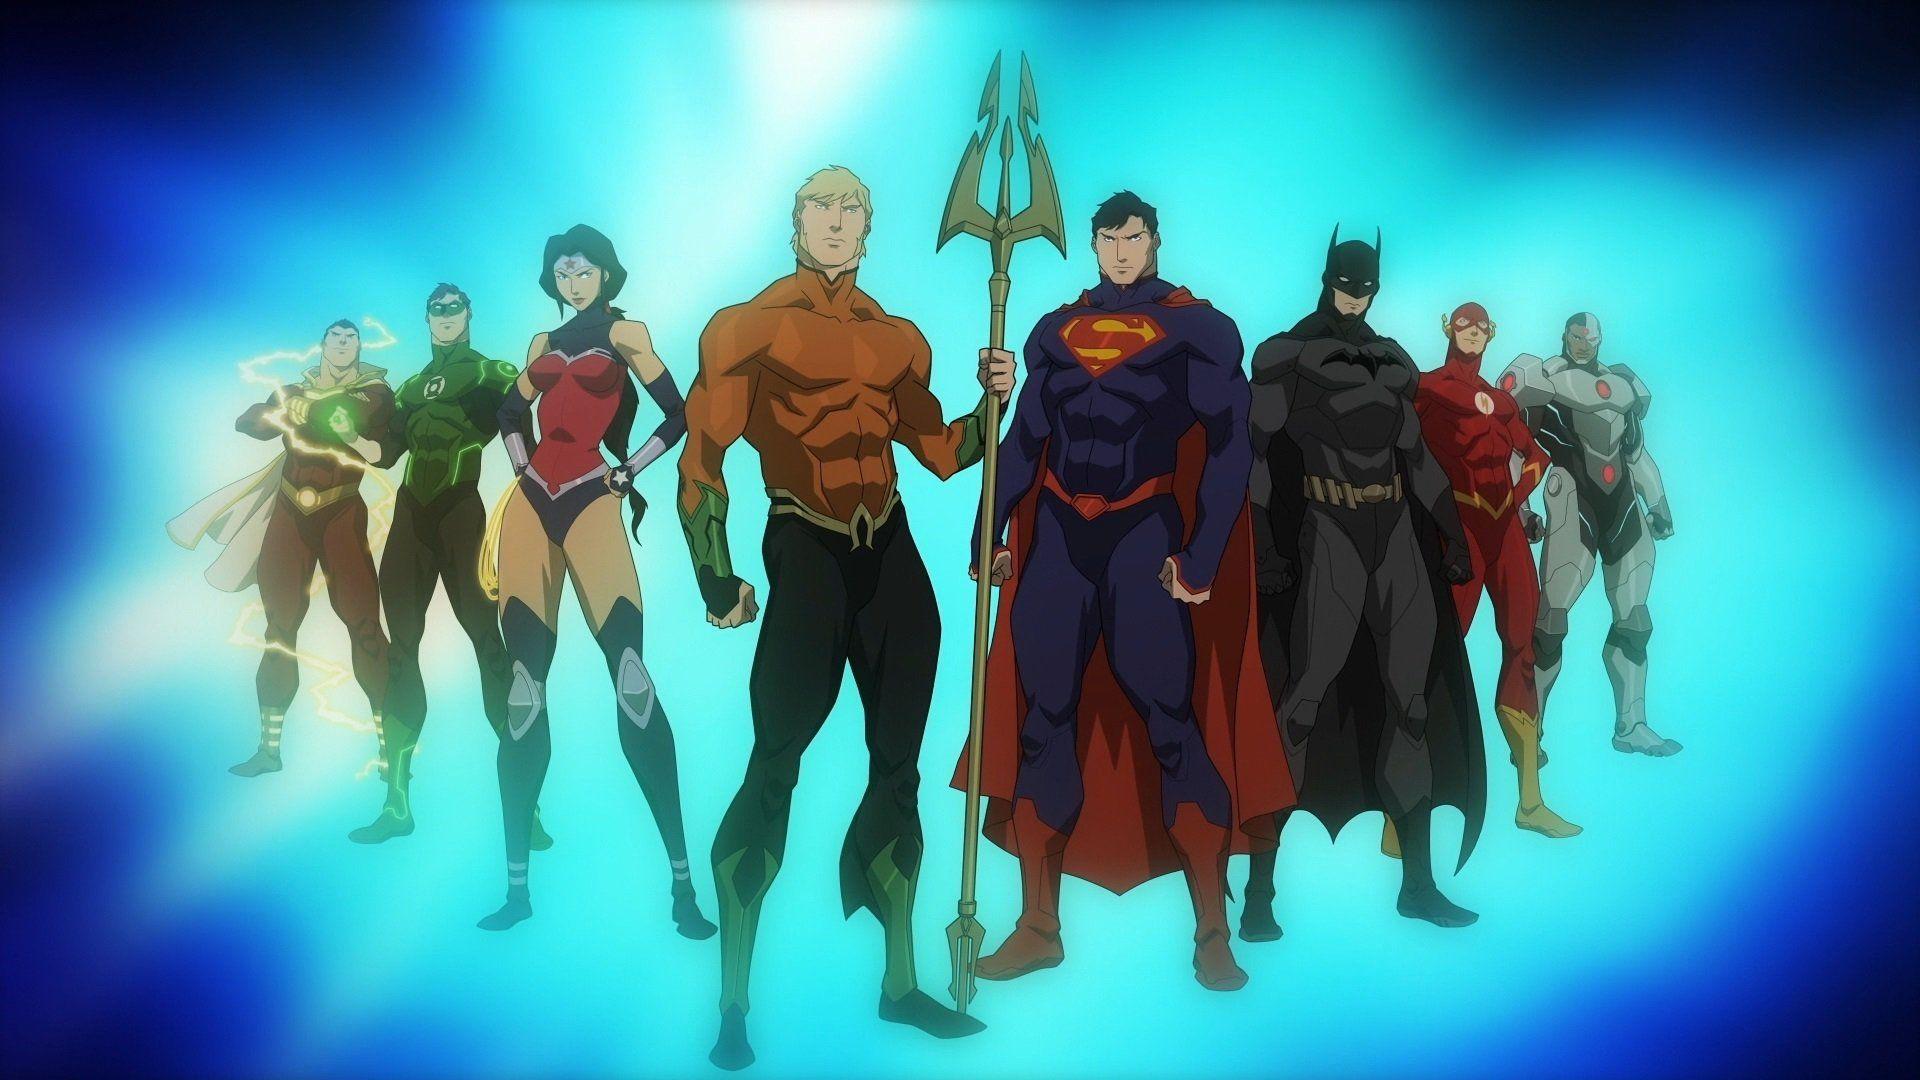 Movie Justice League Throne Of Atlantis Wallpaper